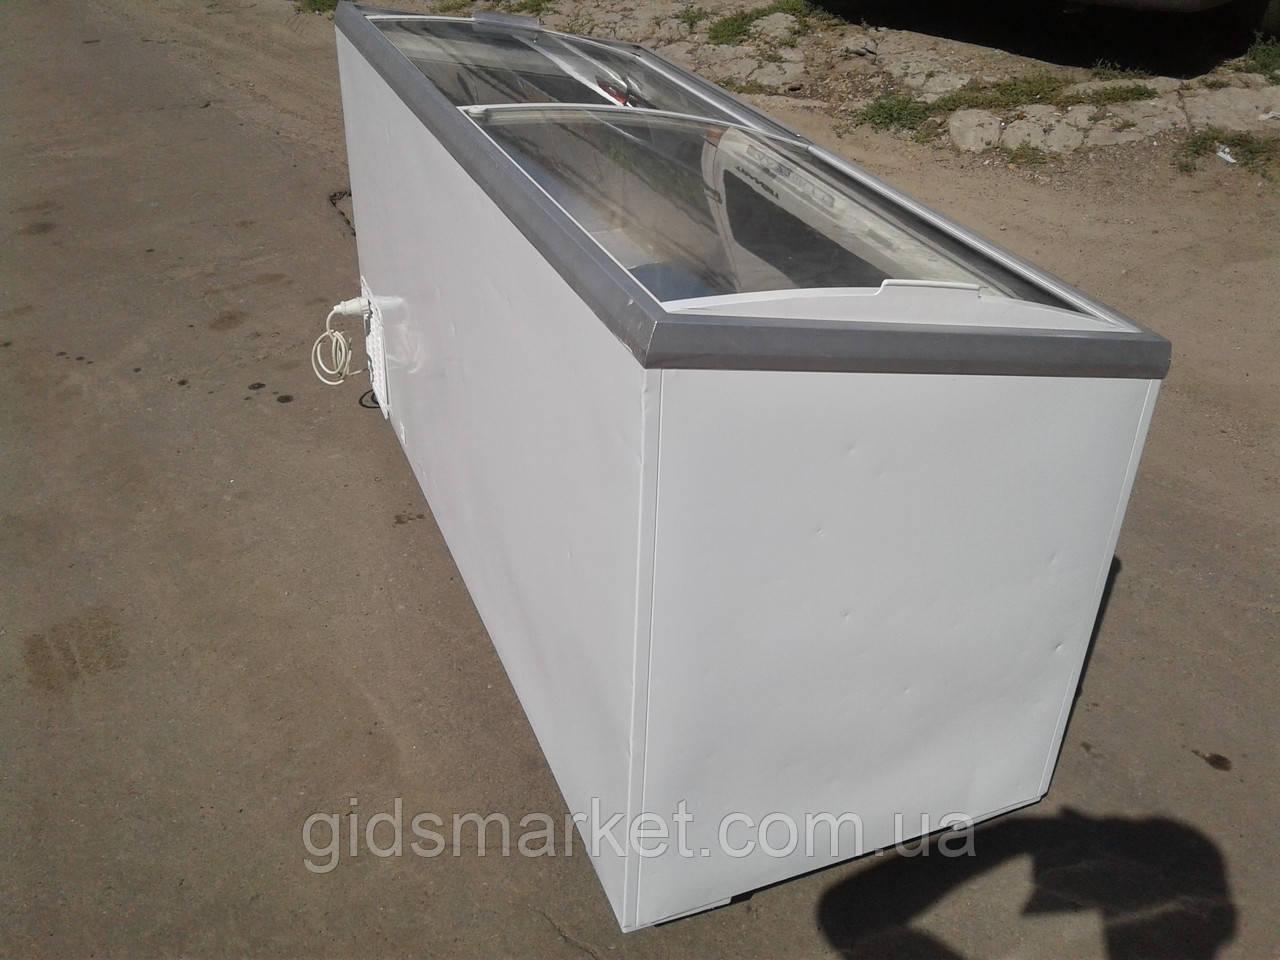 Ларь морозильный Klimasan D 500 б/у, морозильная камера б/у, морозильный ларь б/у